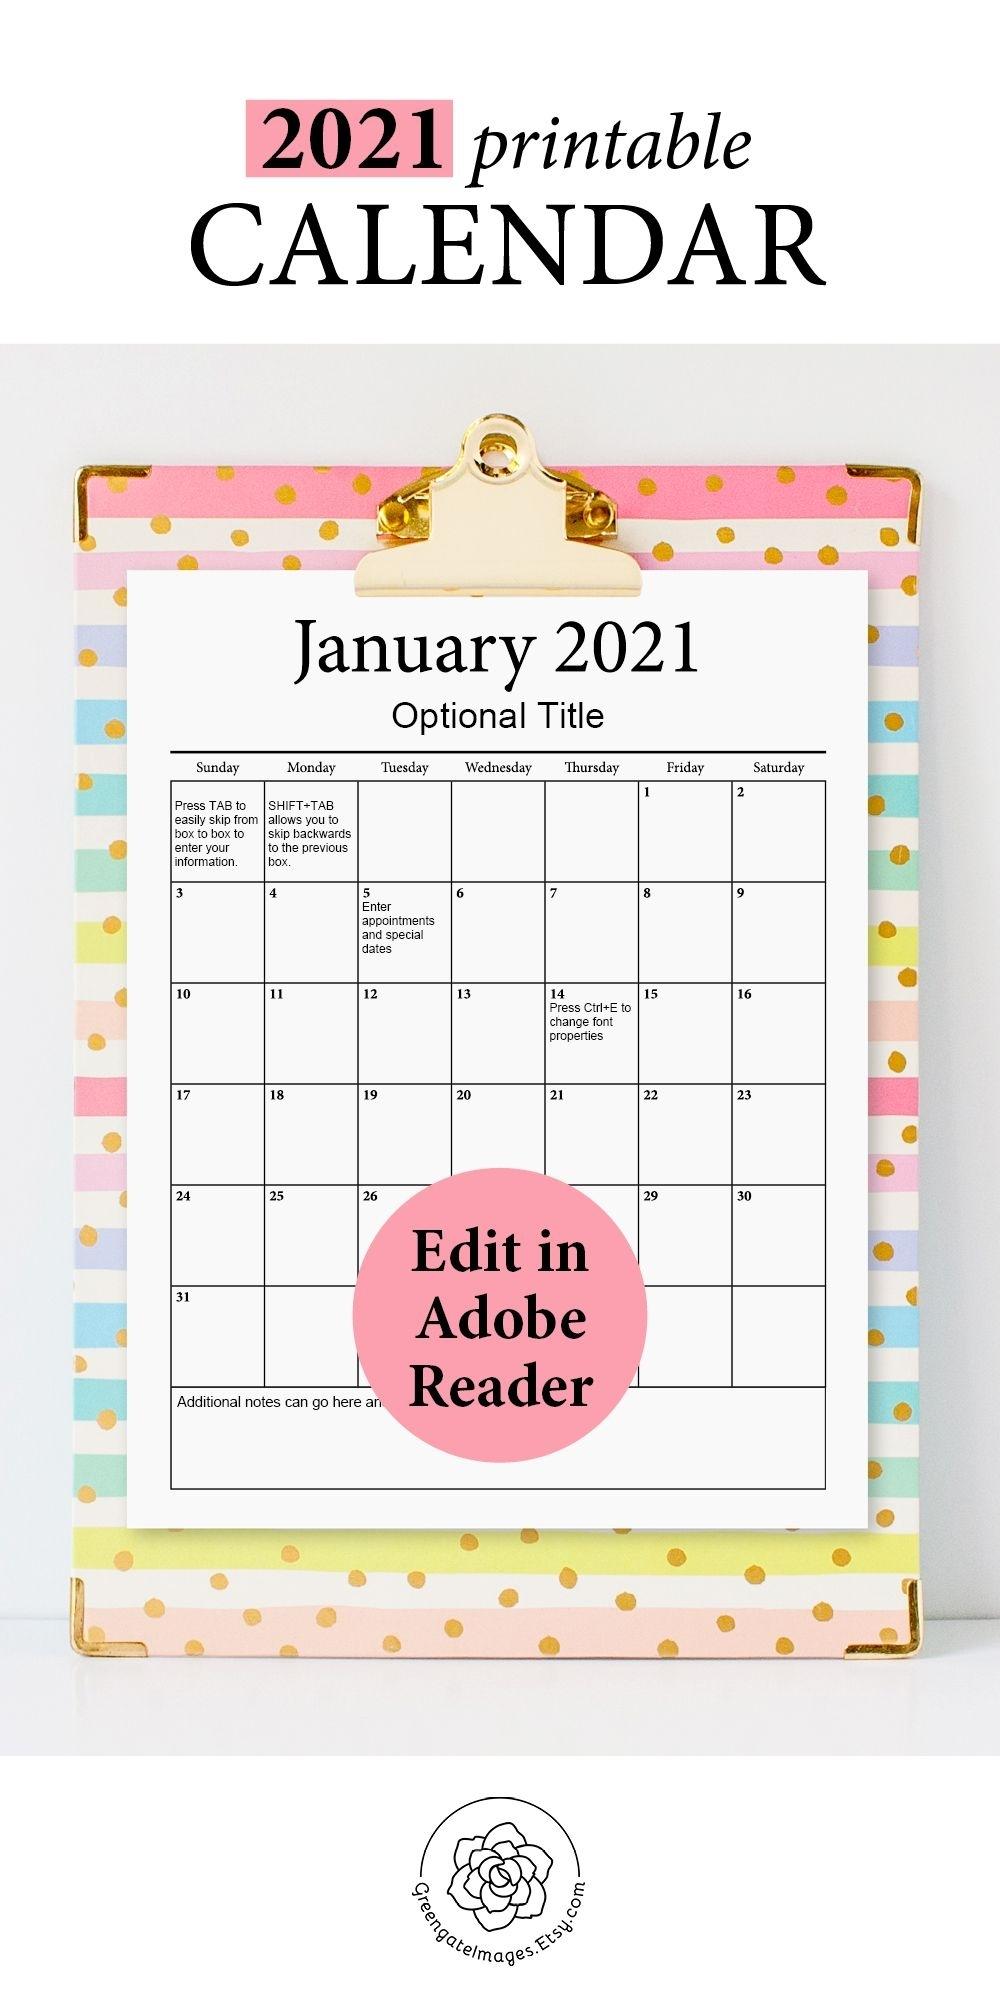 2021 Printable Calendar - Fillable Planner, Editable Pdf